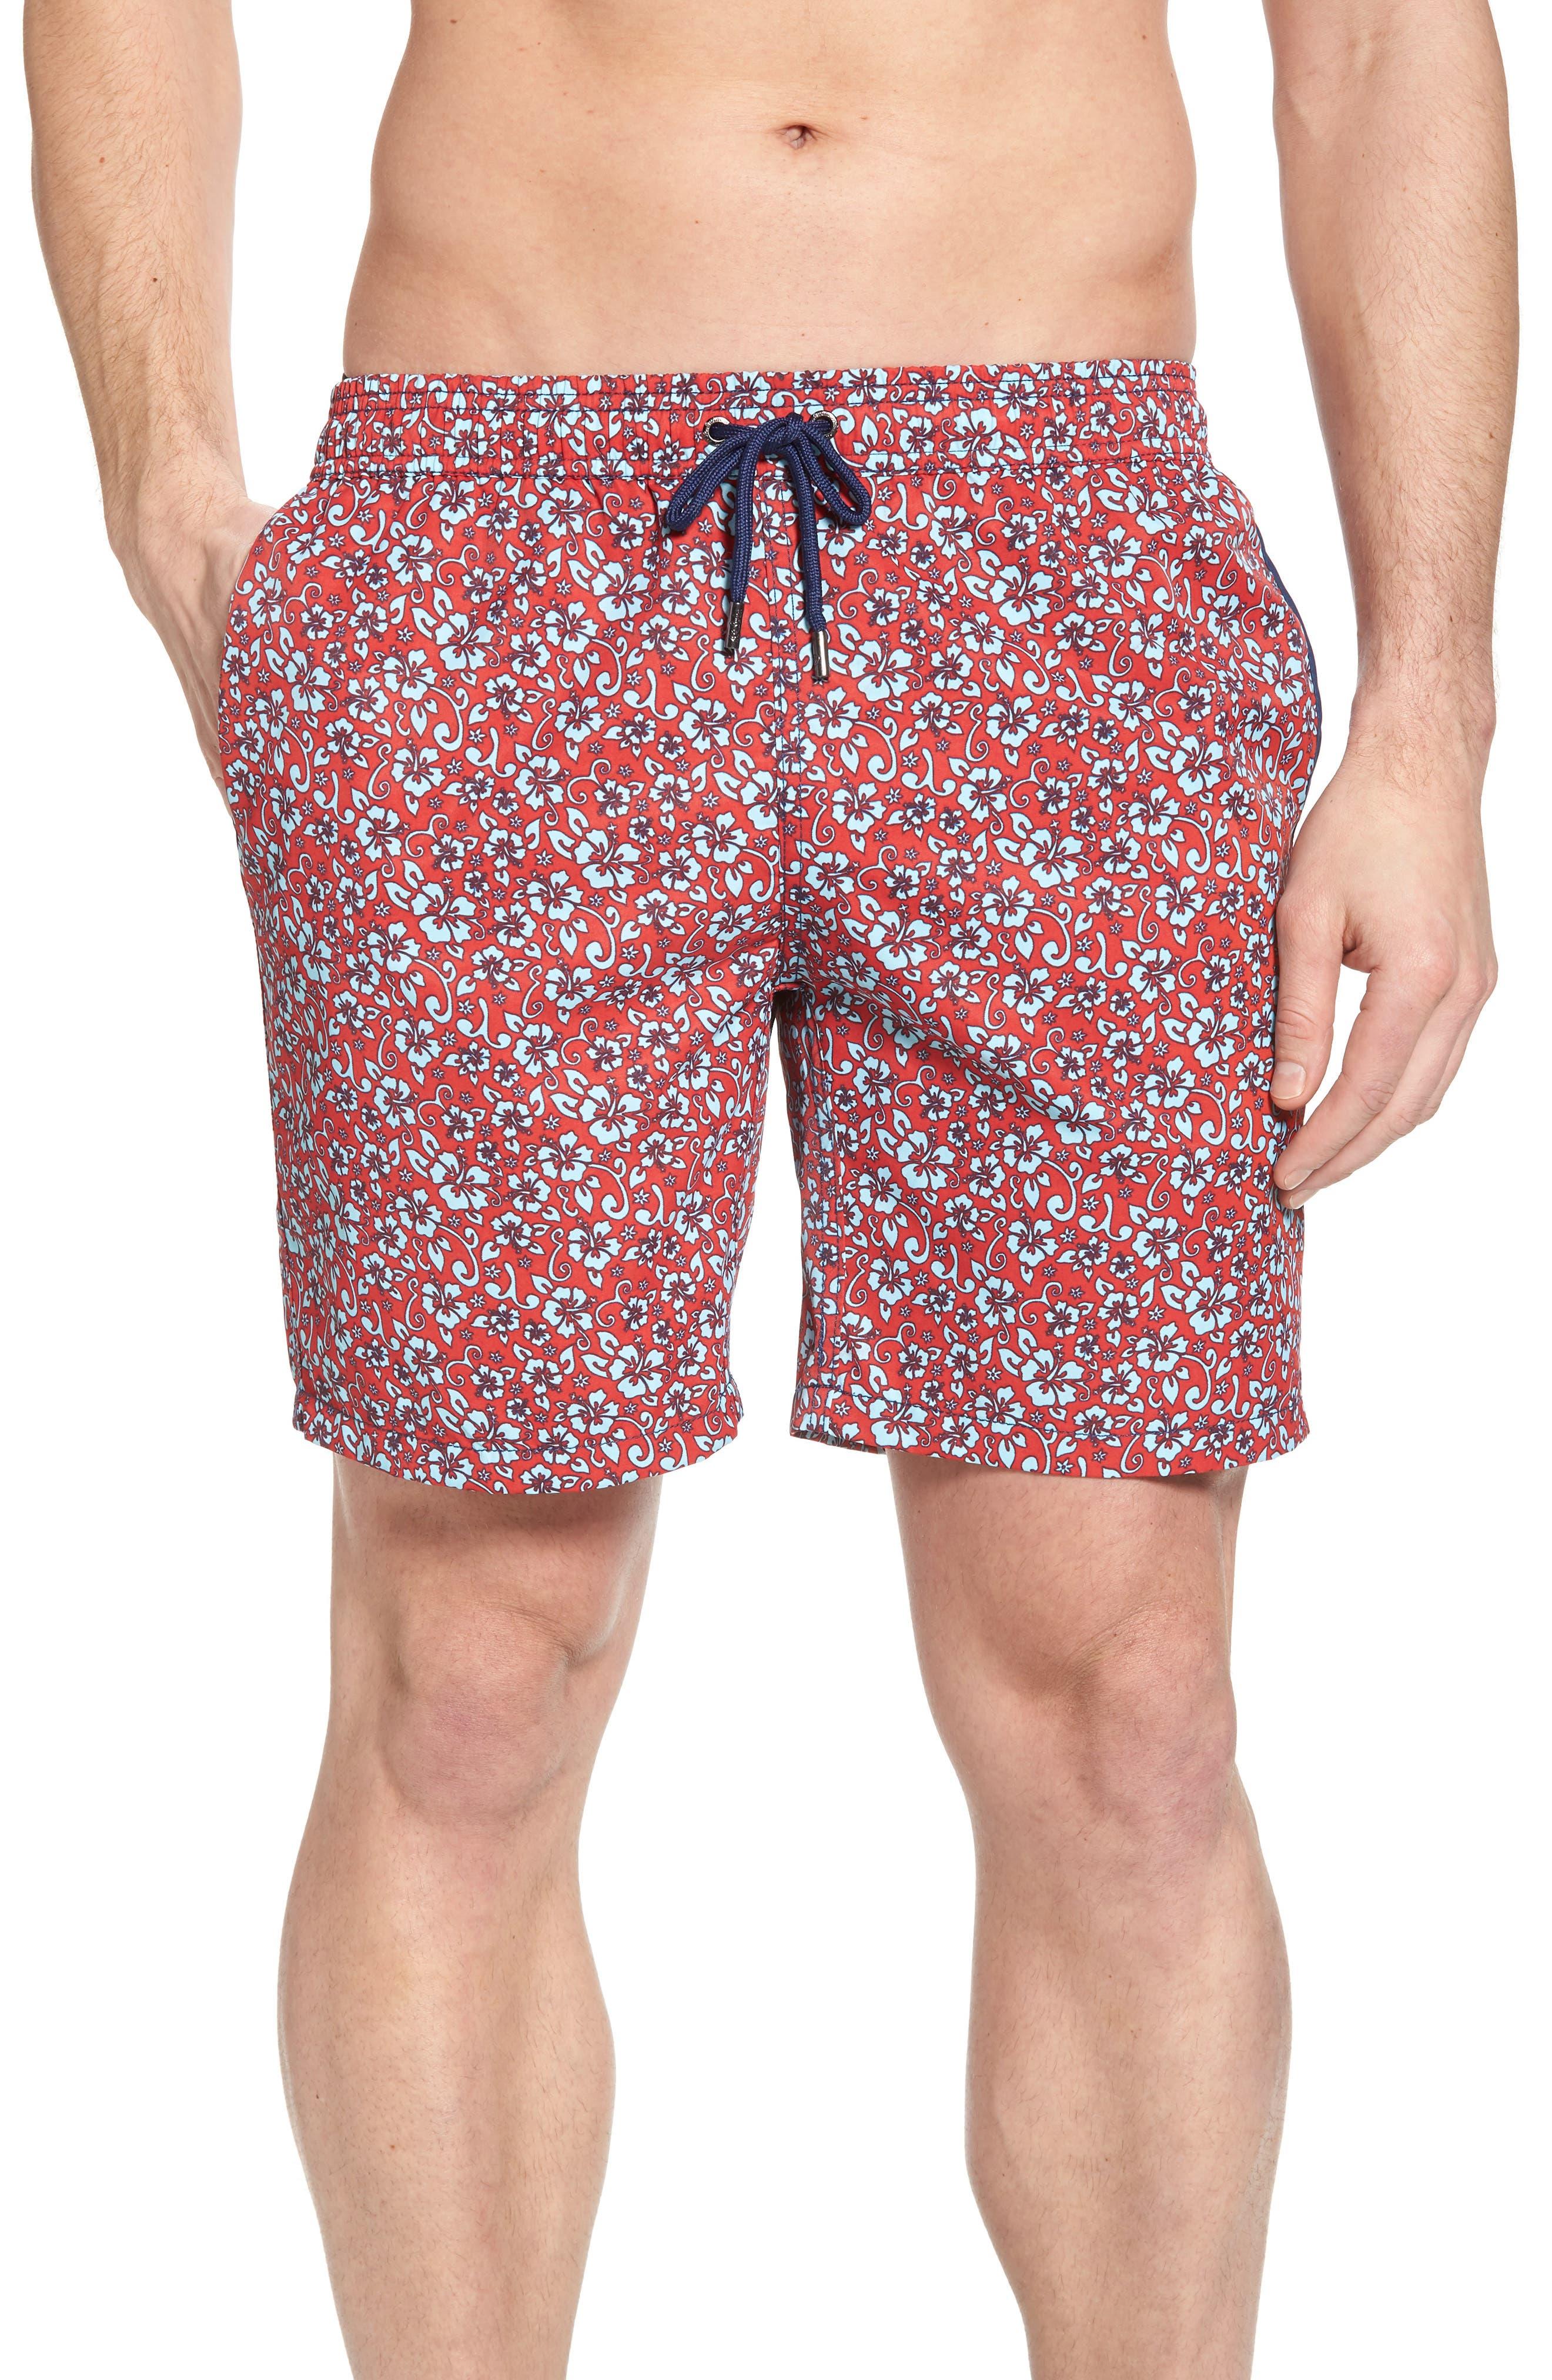 Mr. Swim Trim Fit Floral Swim Trunks,                         Main,                         color, Red